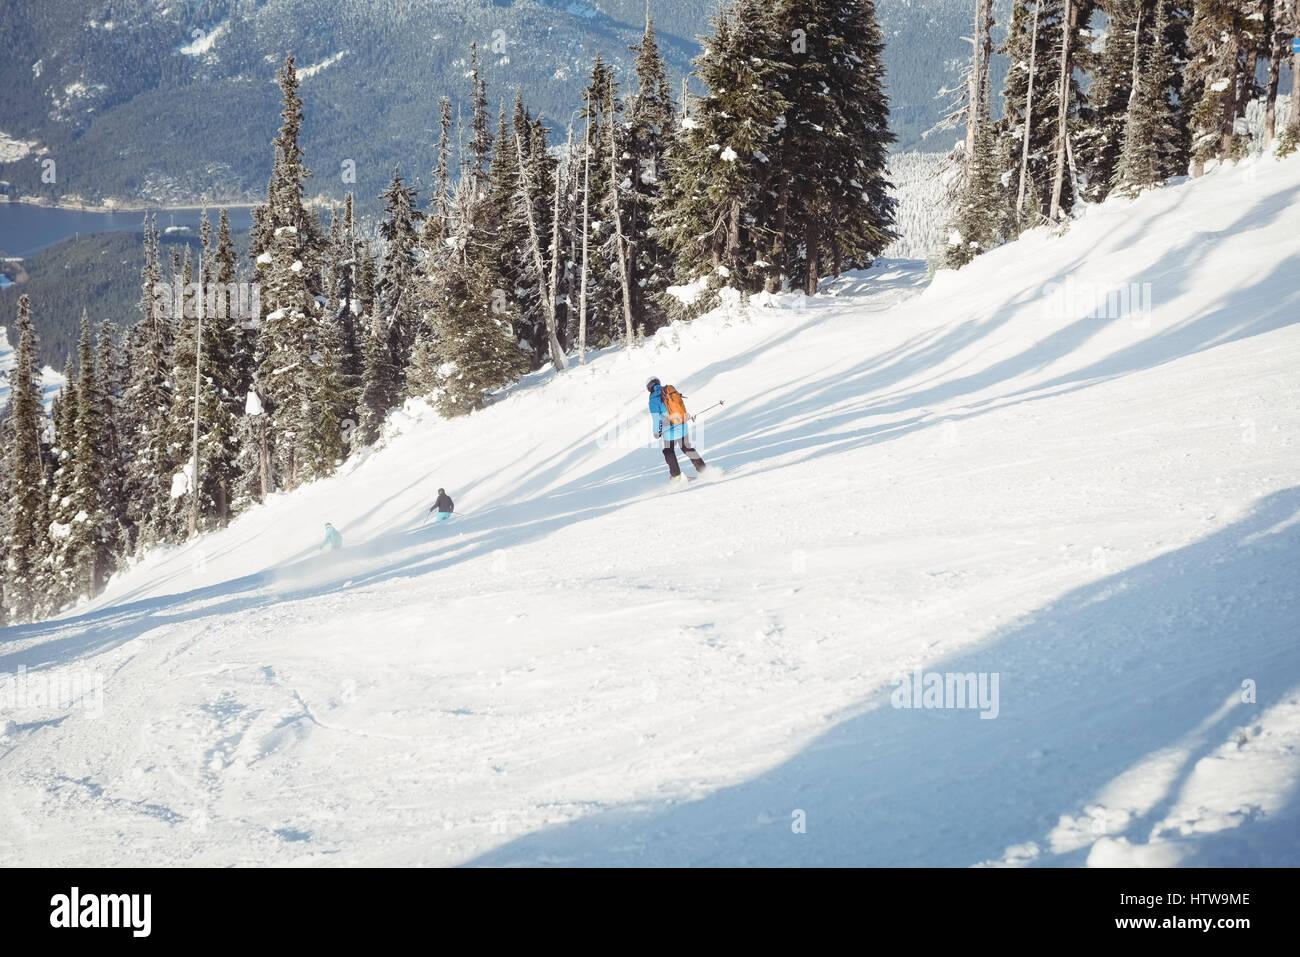 Skier skiing on snowy mountains - Stock Image